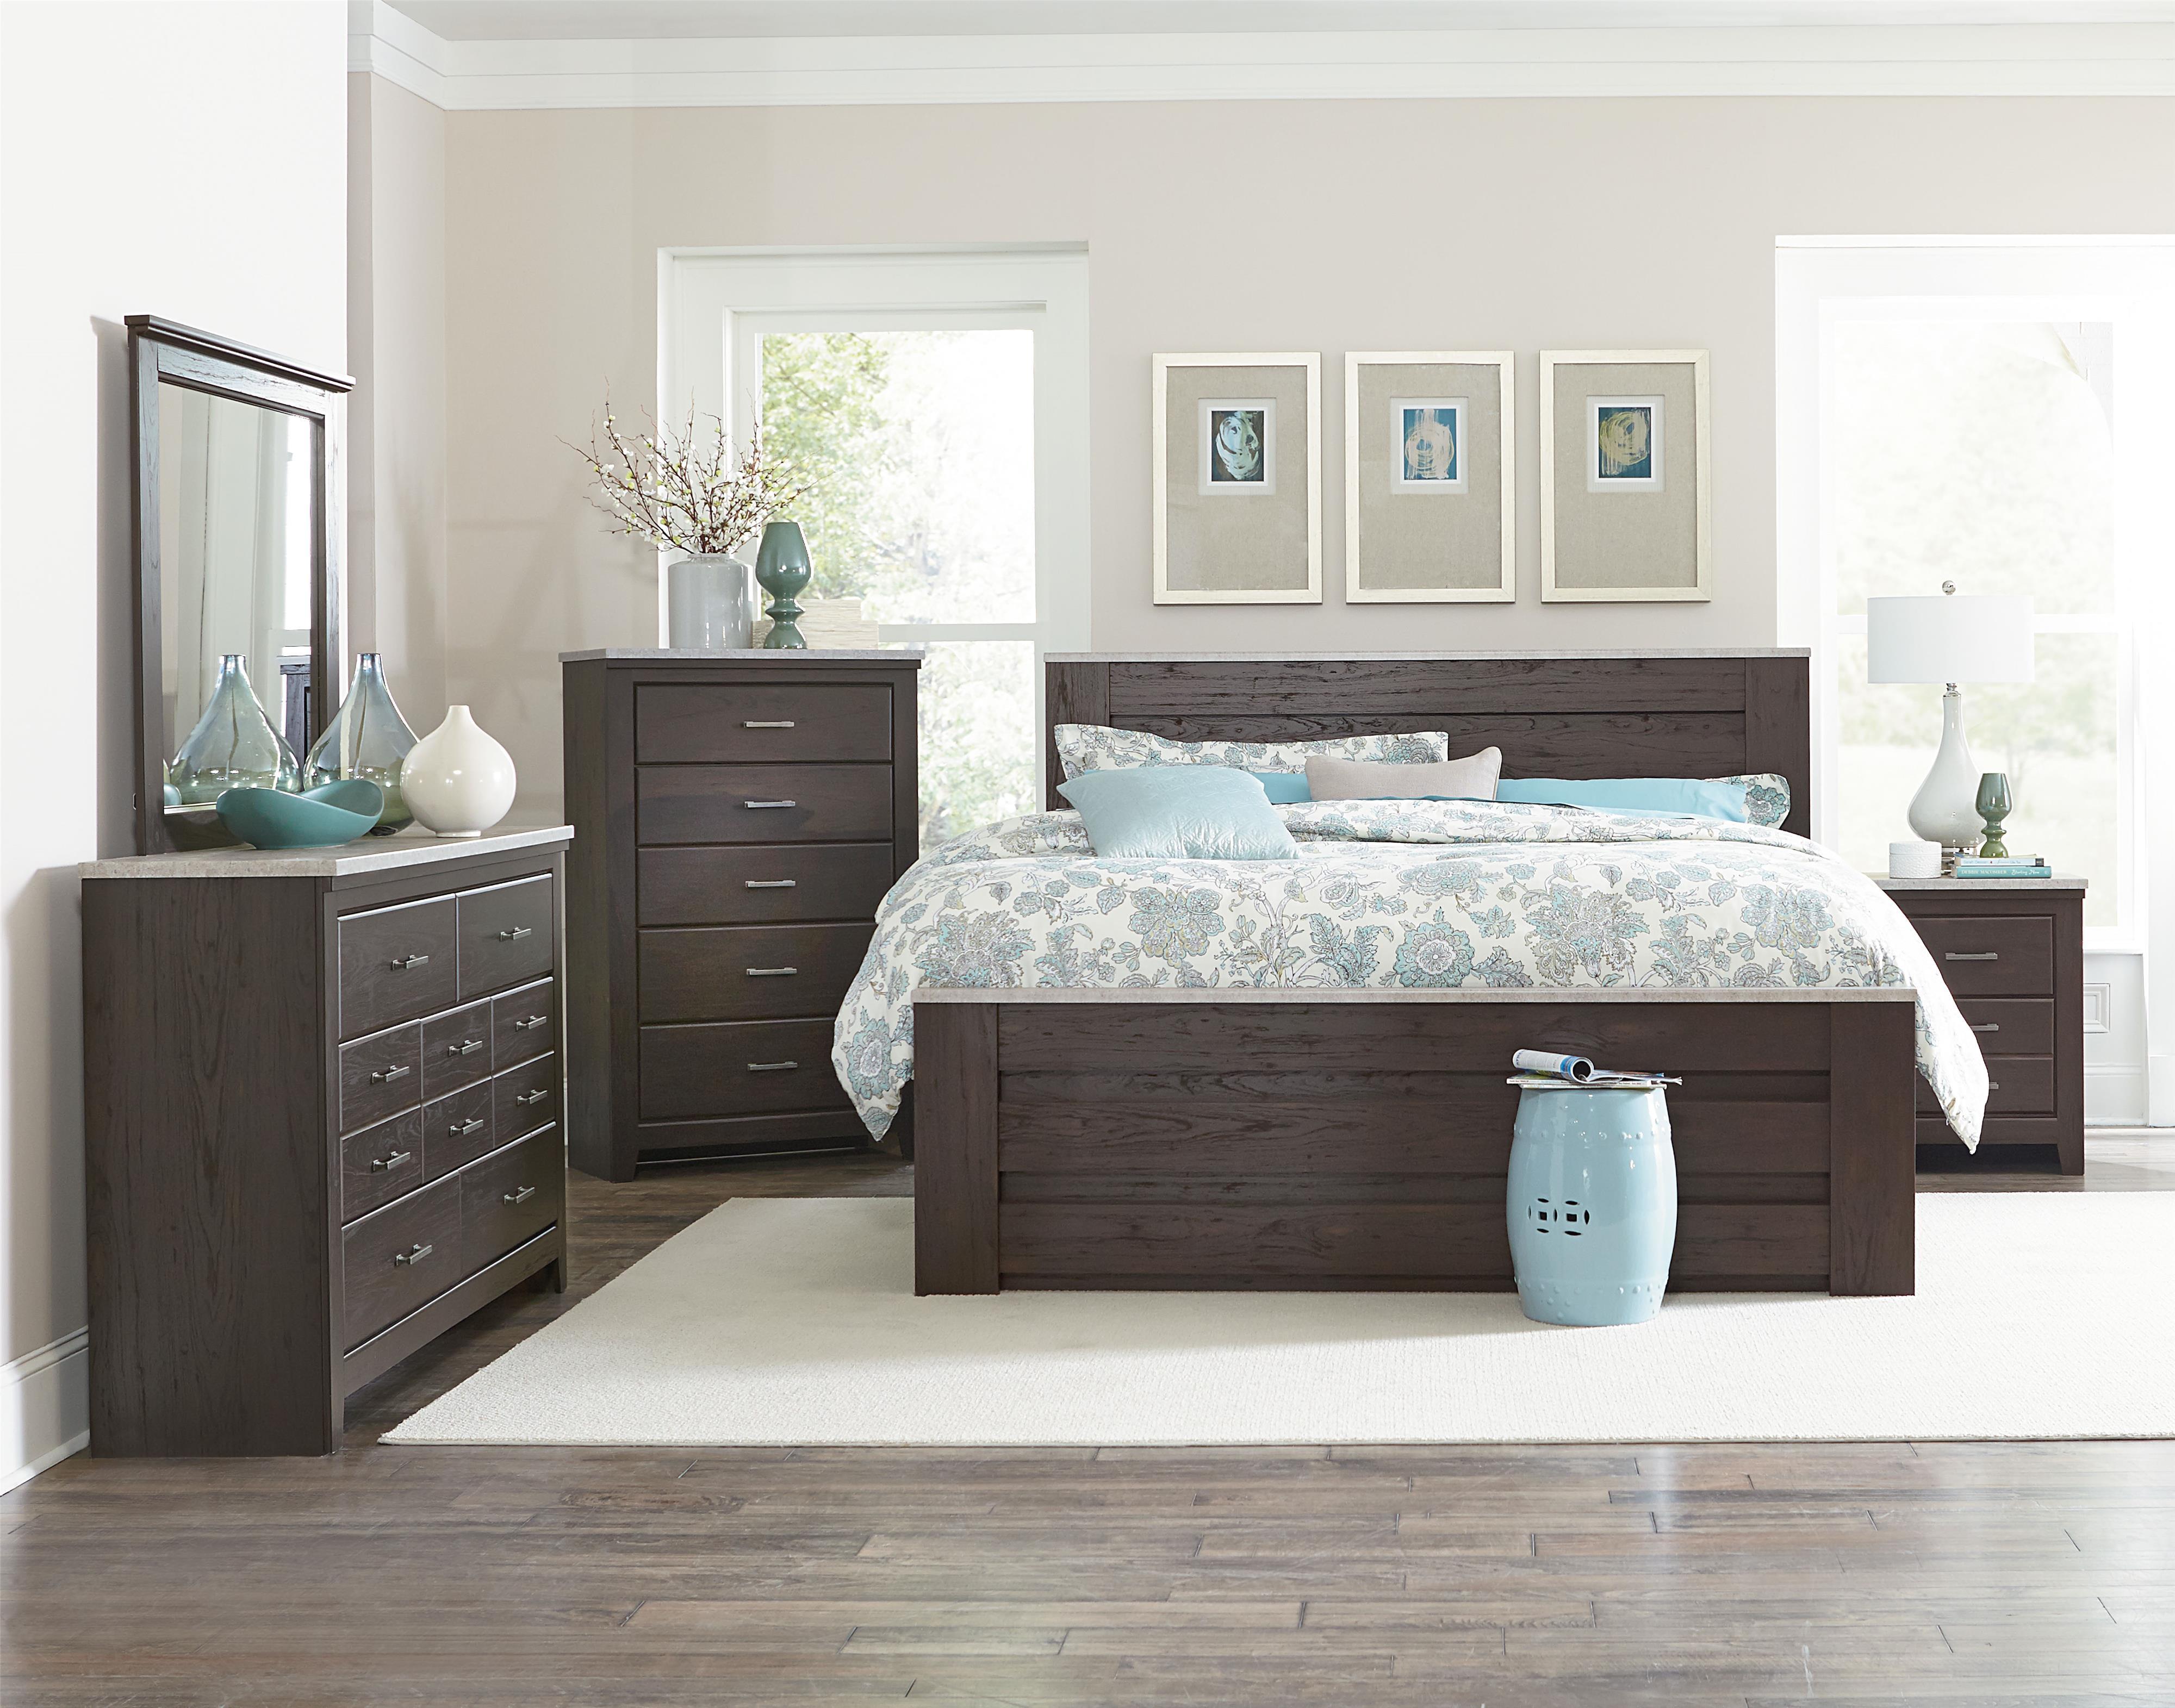 Standard Furniture Stonehill Dark King Bedroom Group - Item Number: 69350 K Bedroom Group 2